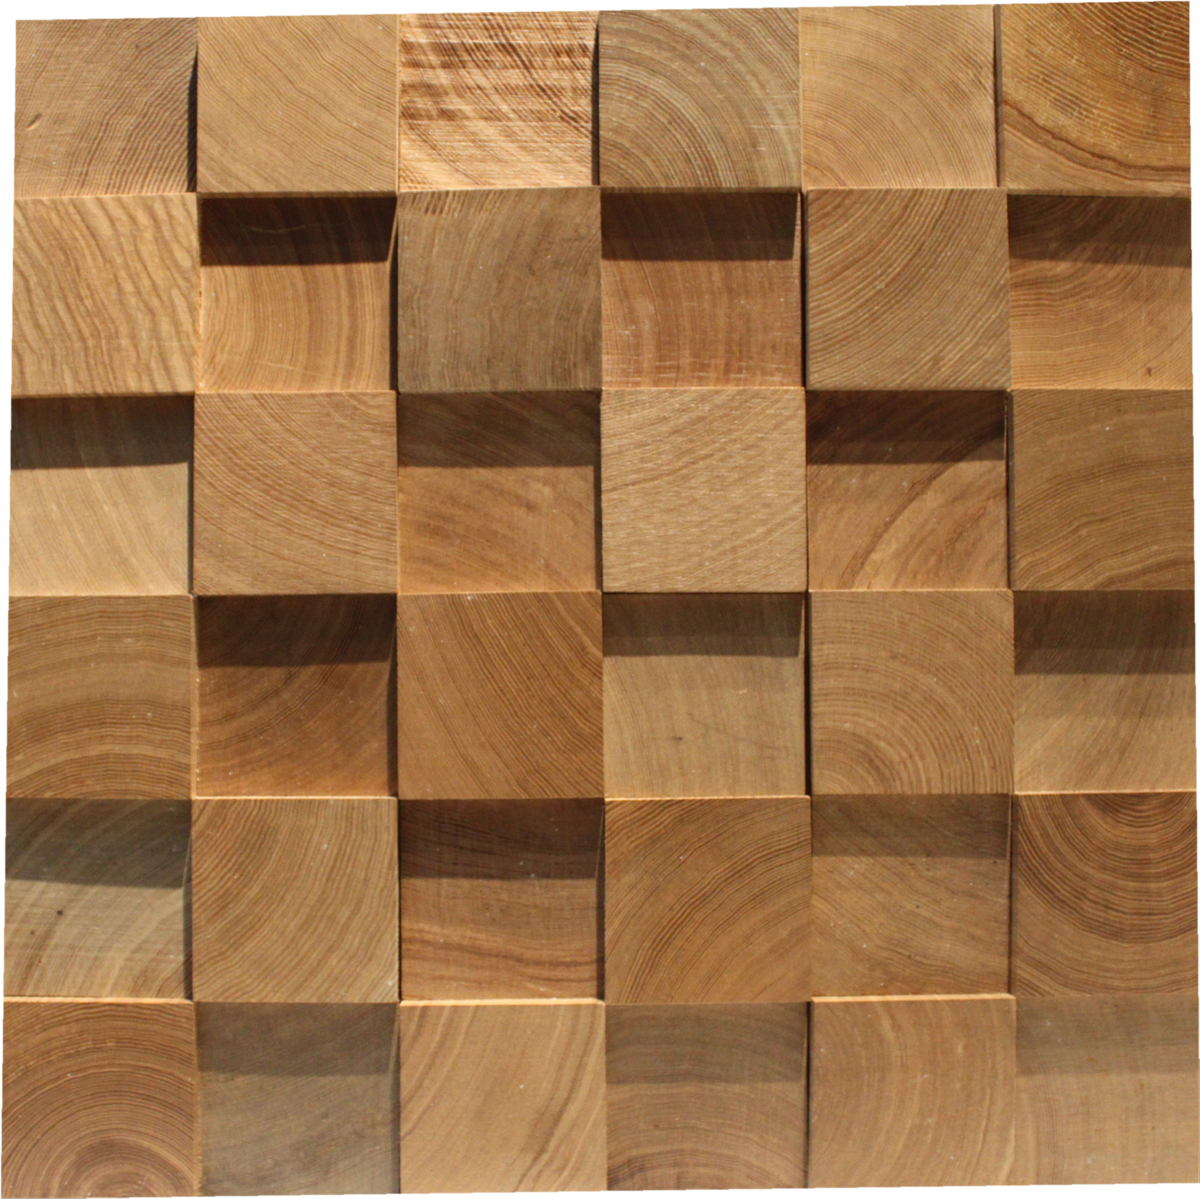 Solid Wood Wall Paneling : Solid wood panel— s navilla wall panel